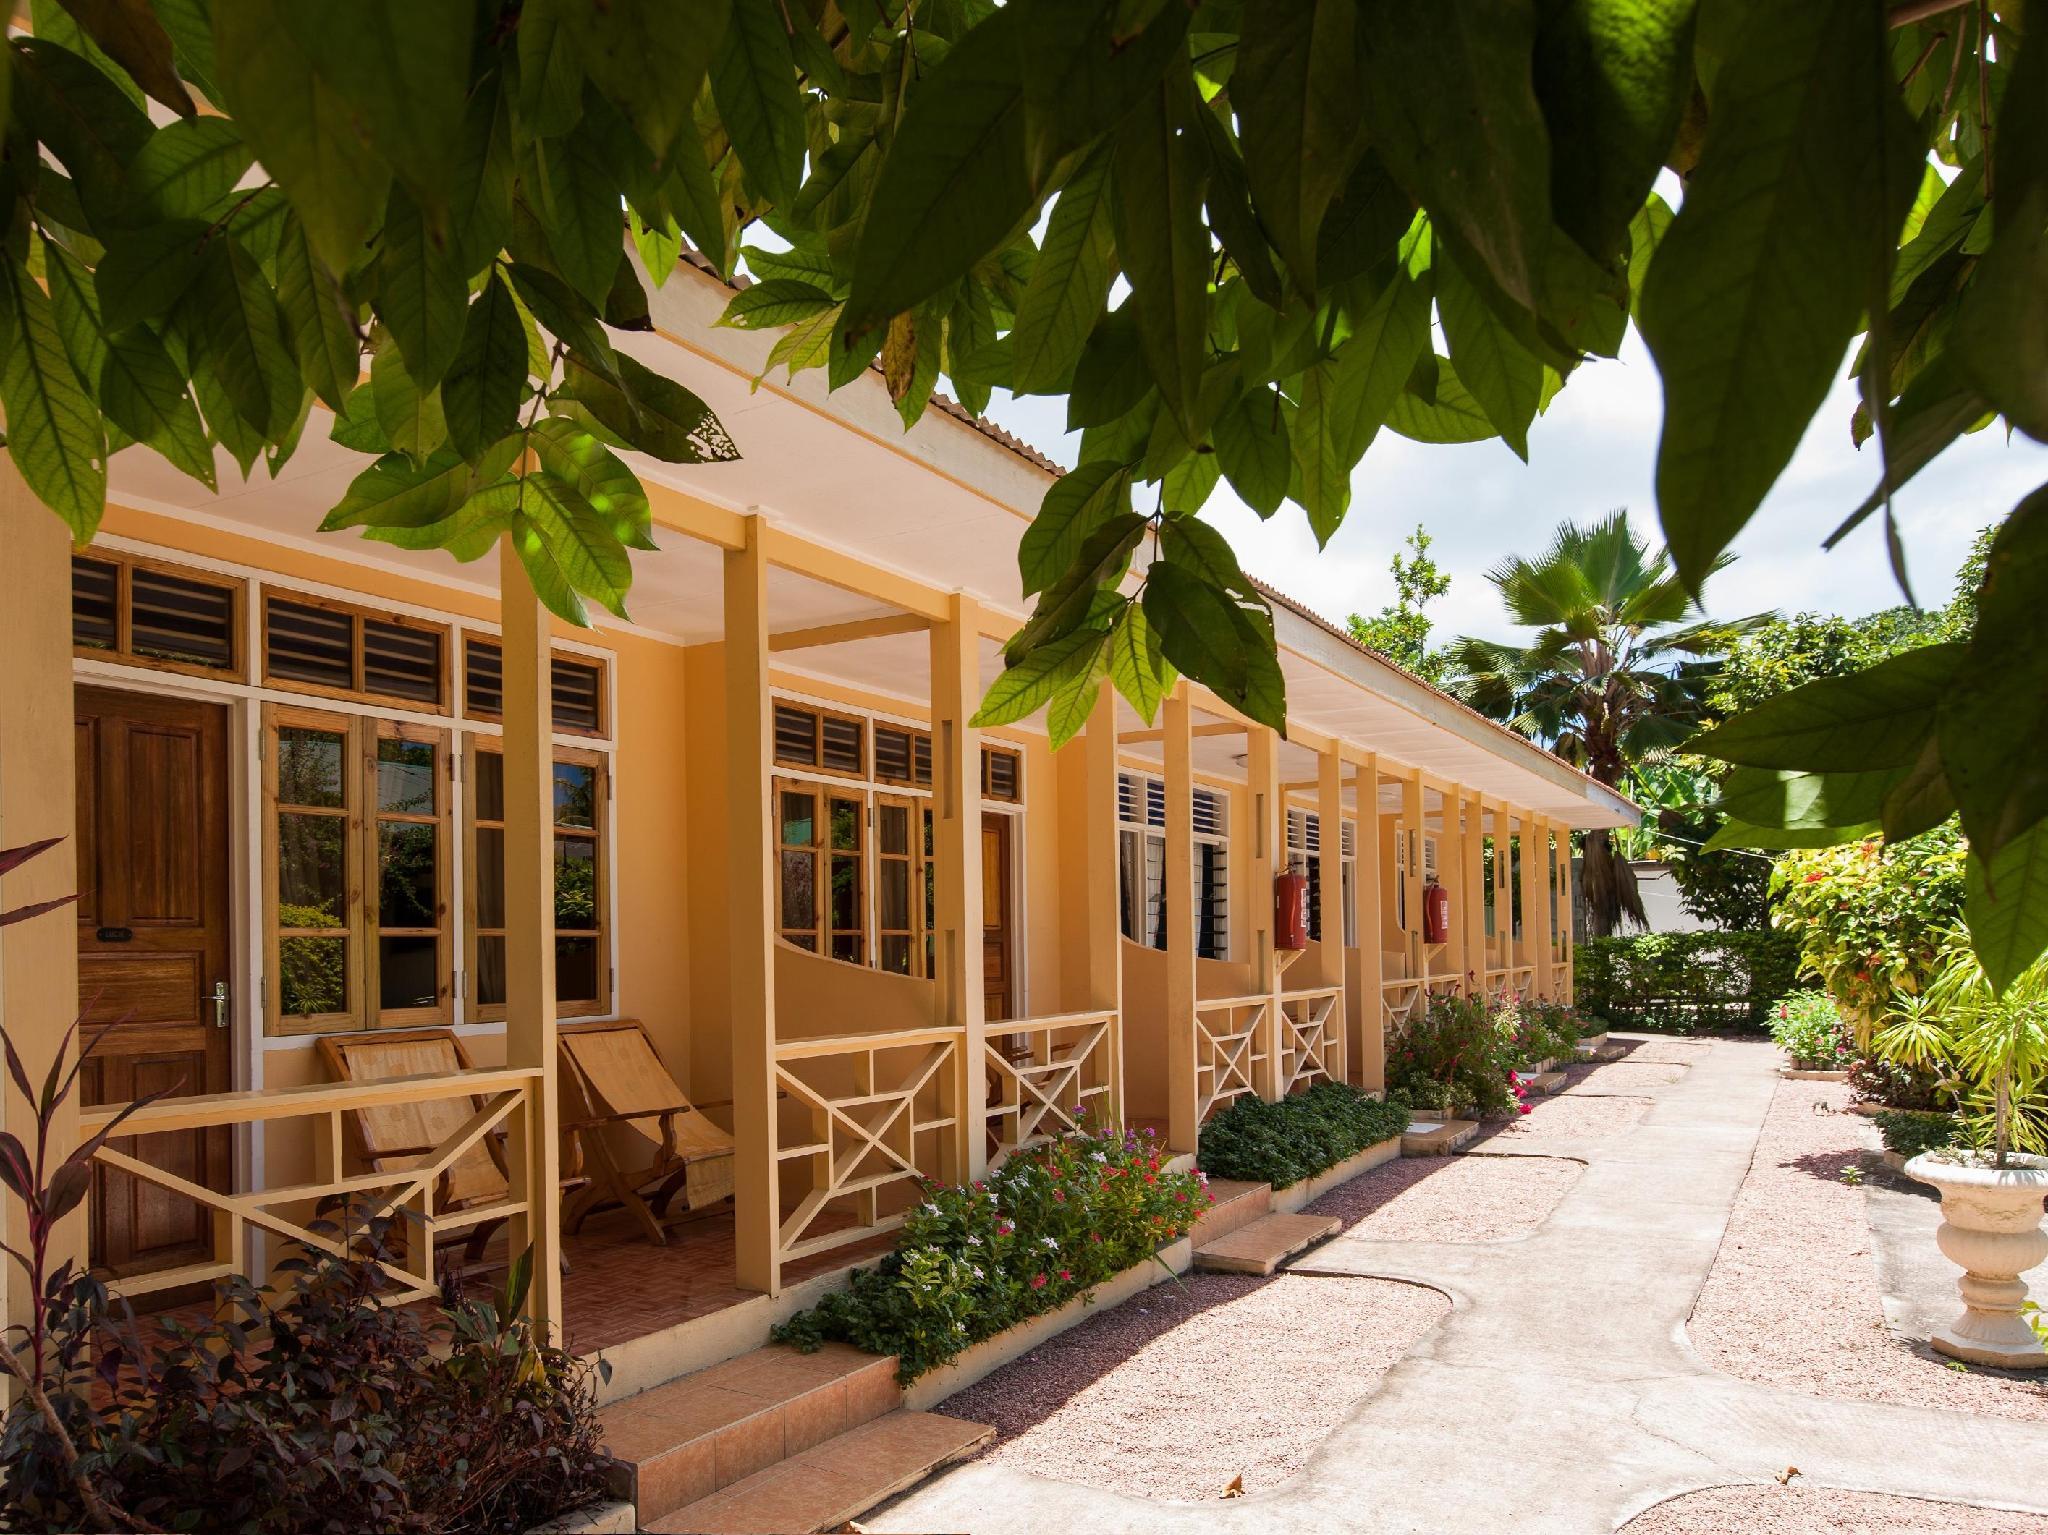 Chez Marston Hotel And Apartment